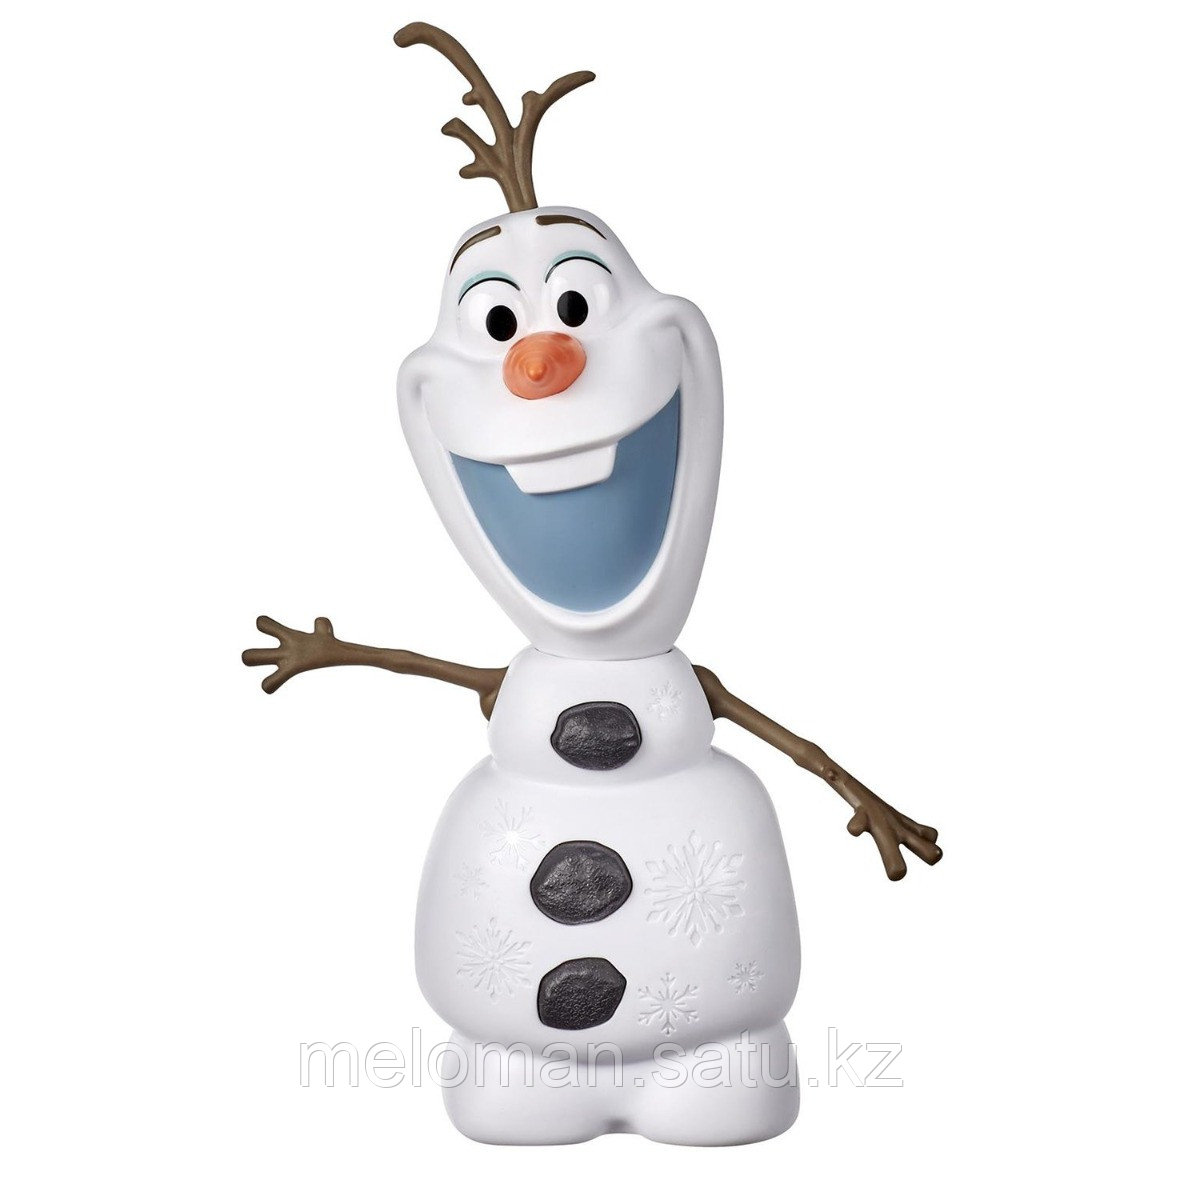 Disney Frozen: ИГРУШКА ХОЛОД СЕРД2 ИНТЕРАКТИВНЫЙ ОЛАФ - фото 2